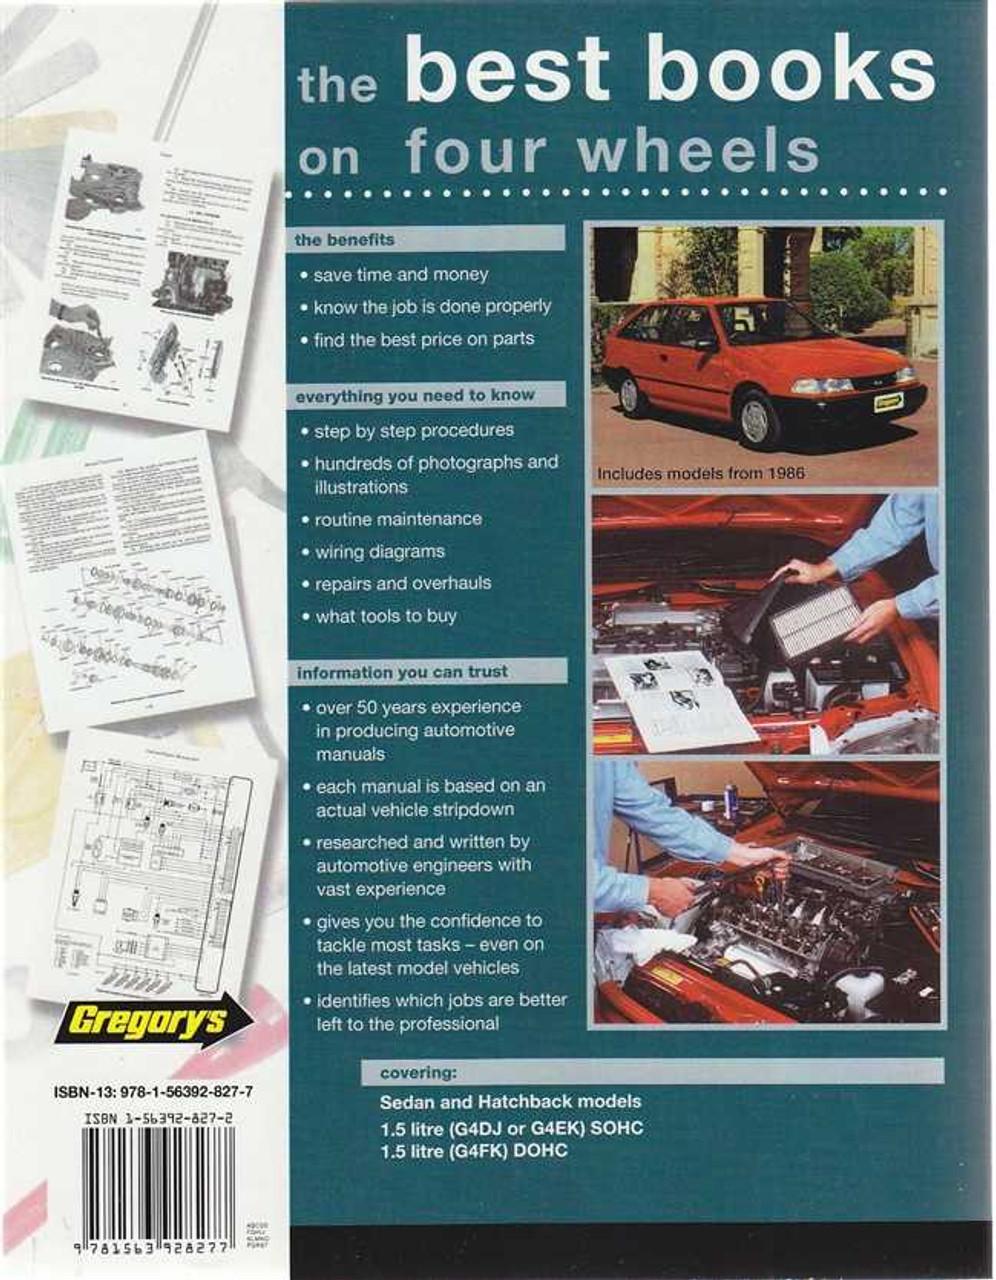 Hyundai Excel 1 5 Litre 1986 - 2000 Workshop Manual